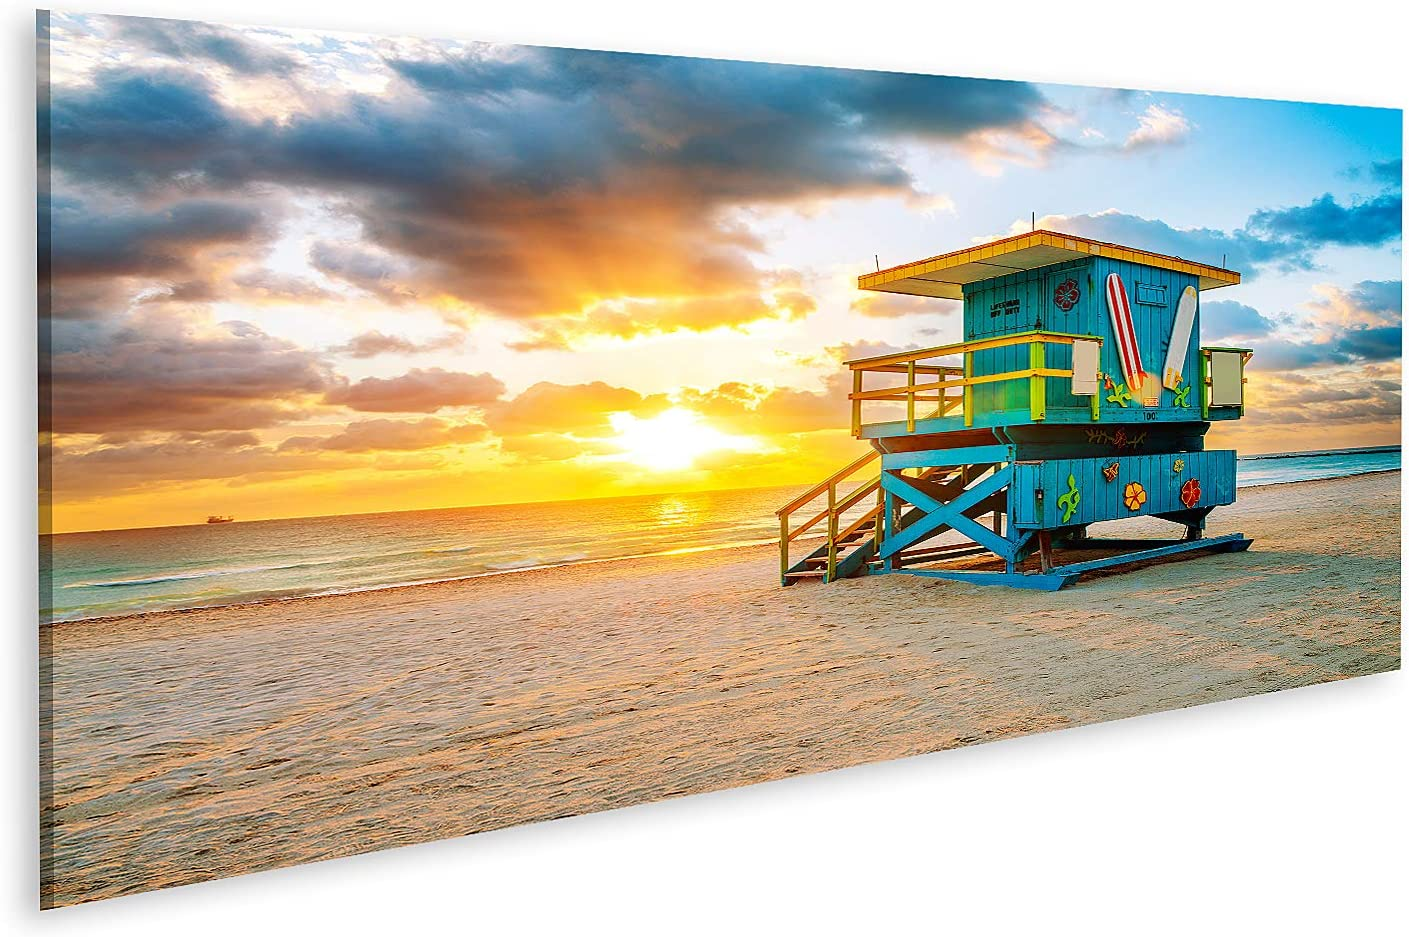 Bild auf Leinwand Miami South Beach Sonnenaufgang Bilder Wandbild Poster Leinwandbild